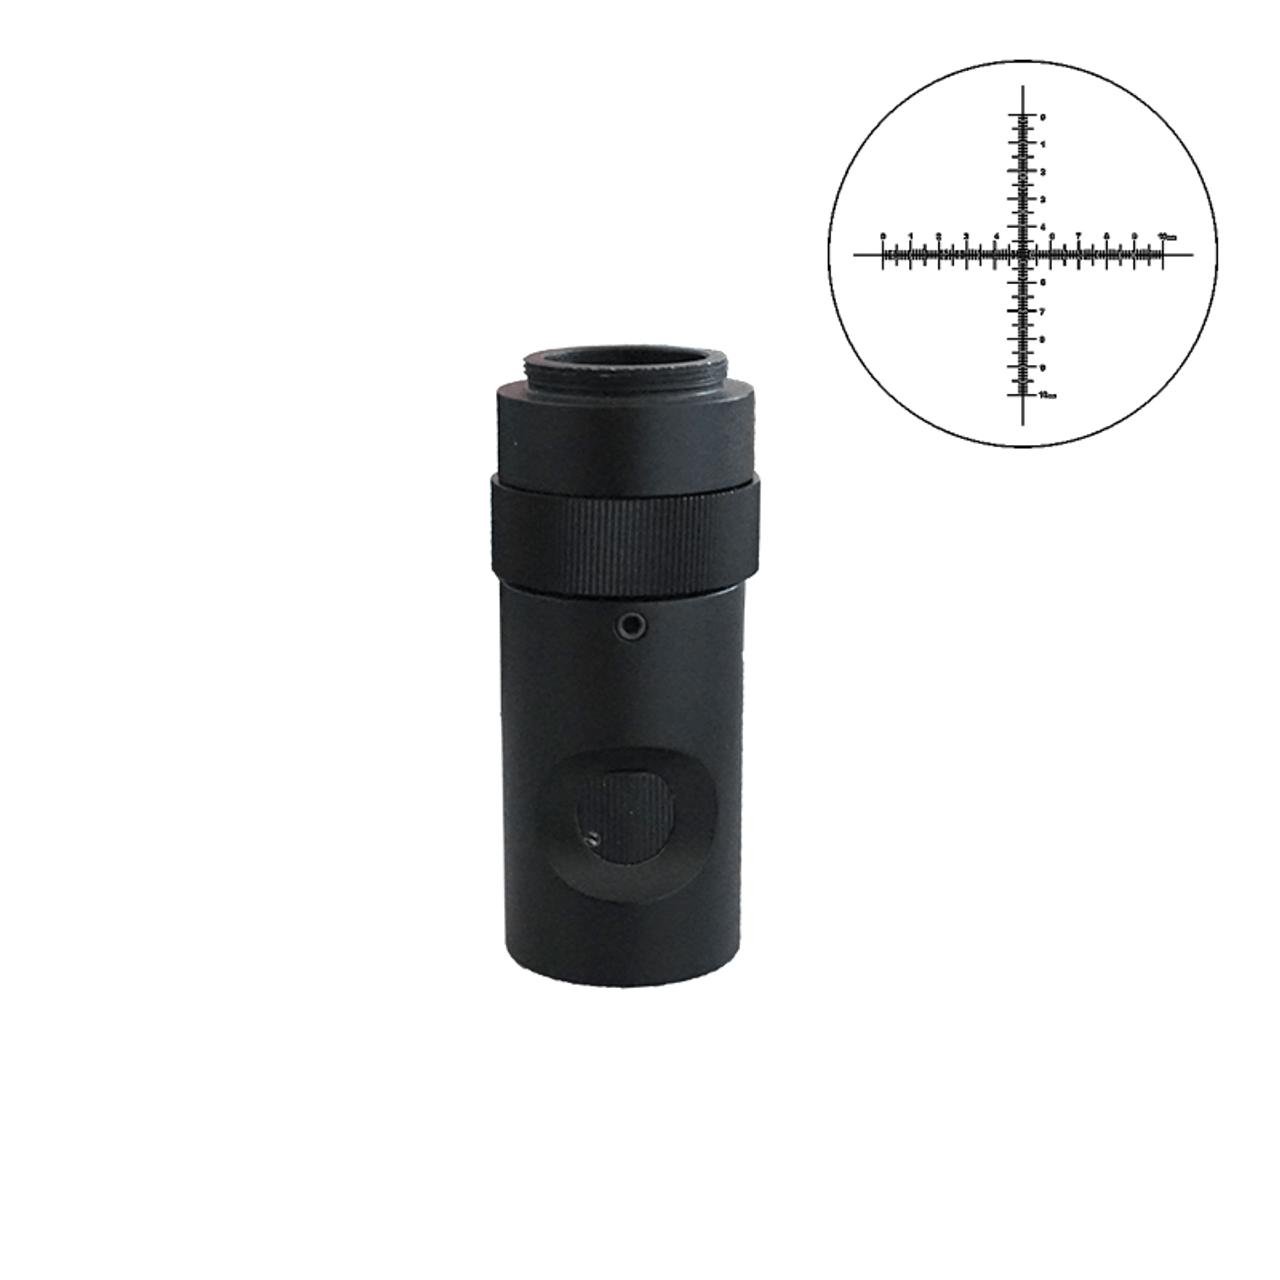 B Blesiya 1X CS C-Mount Adapter CCD Interface Camera per Microscopio Stereo Trinoculare